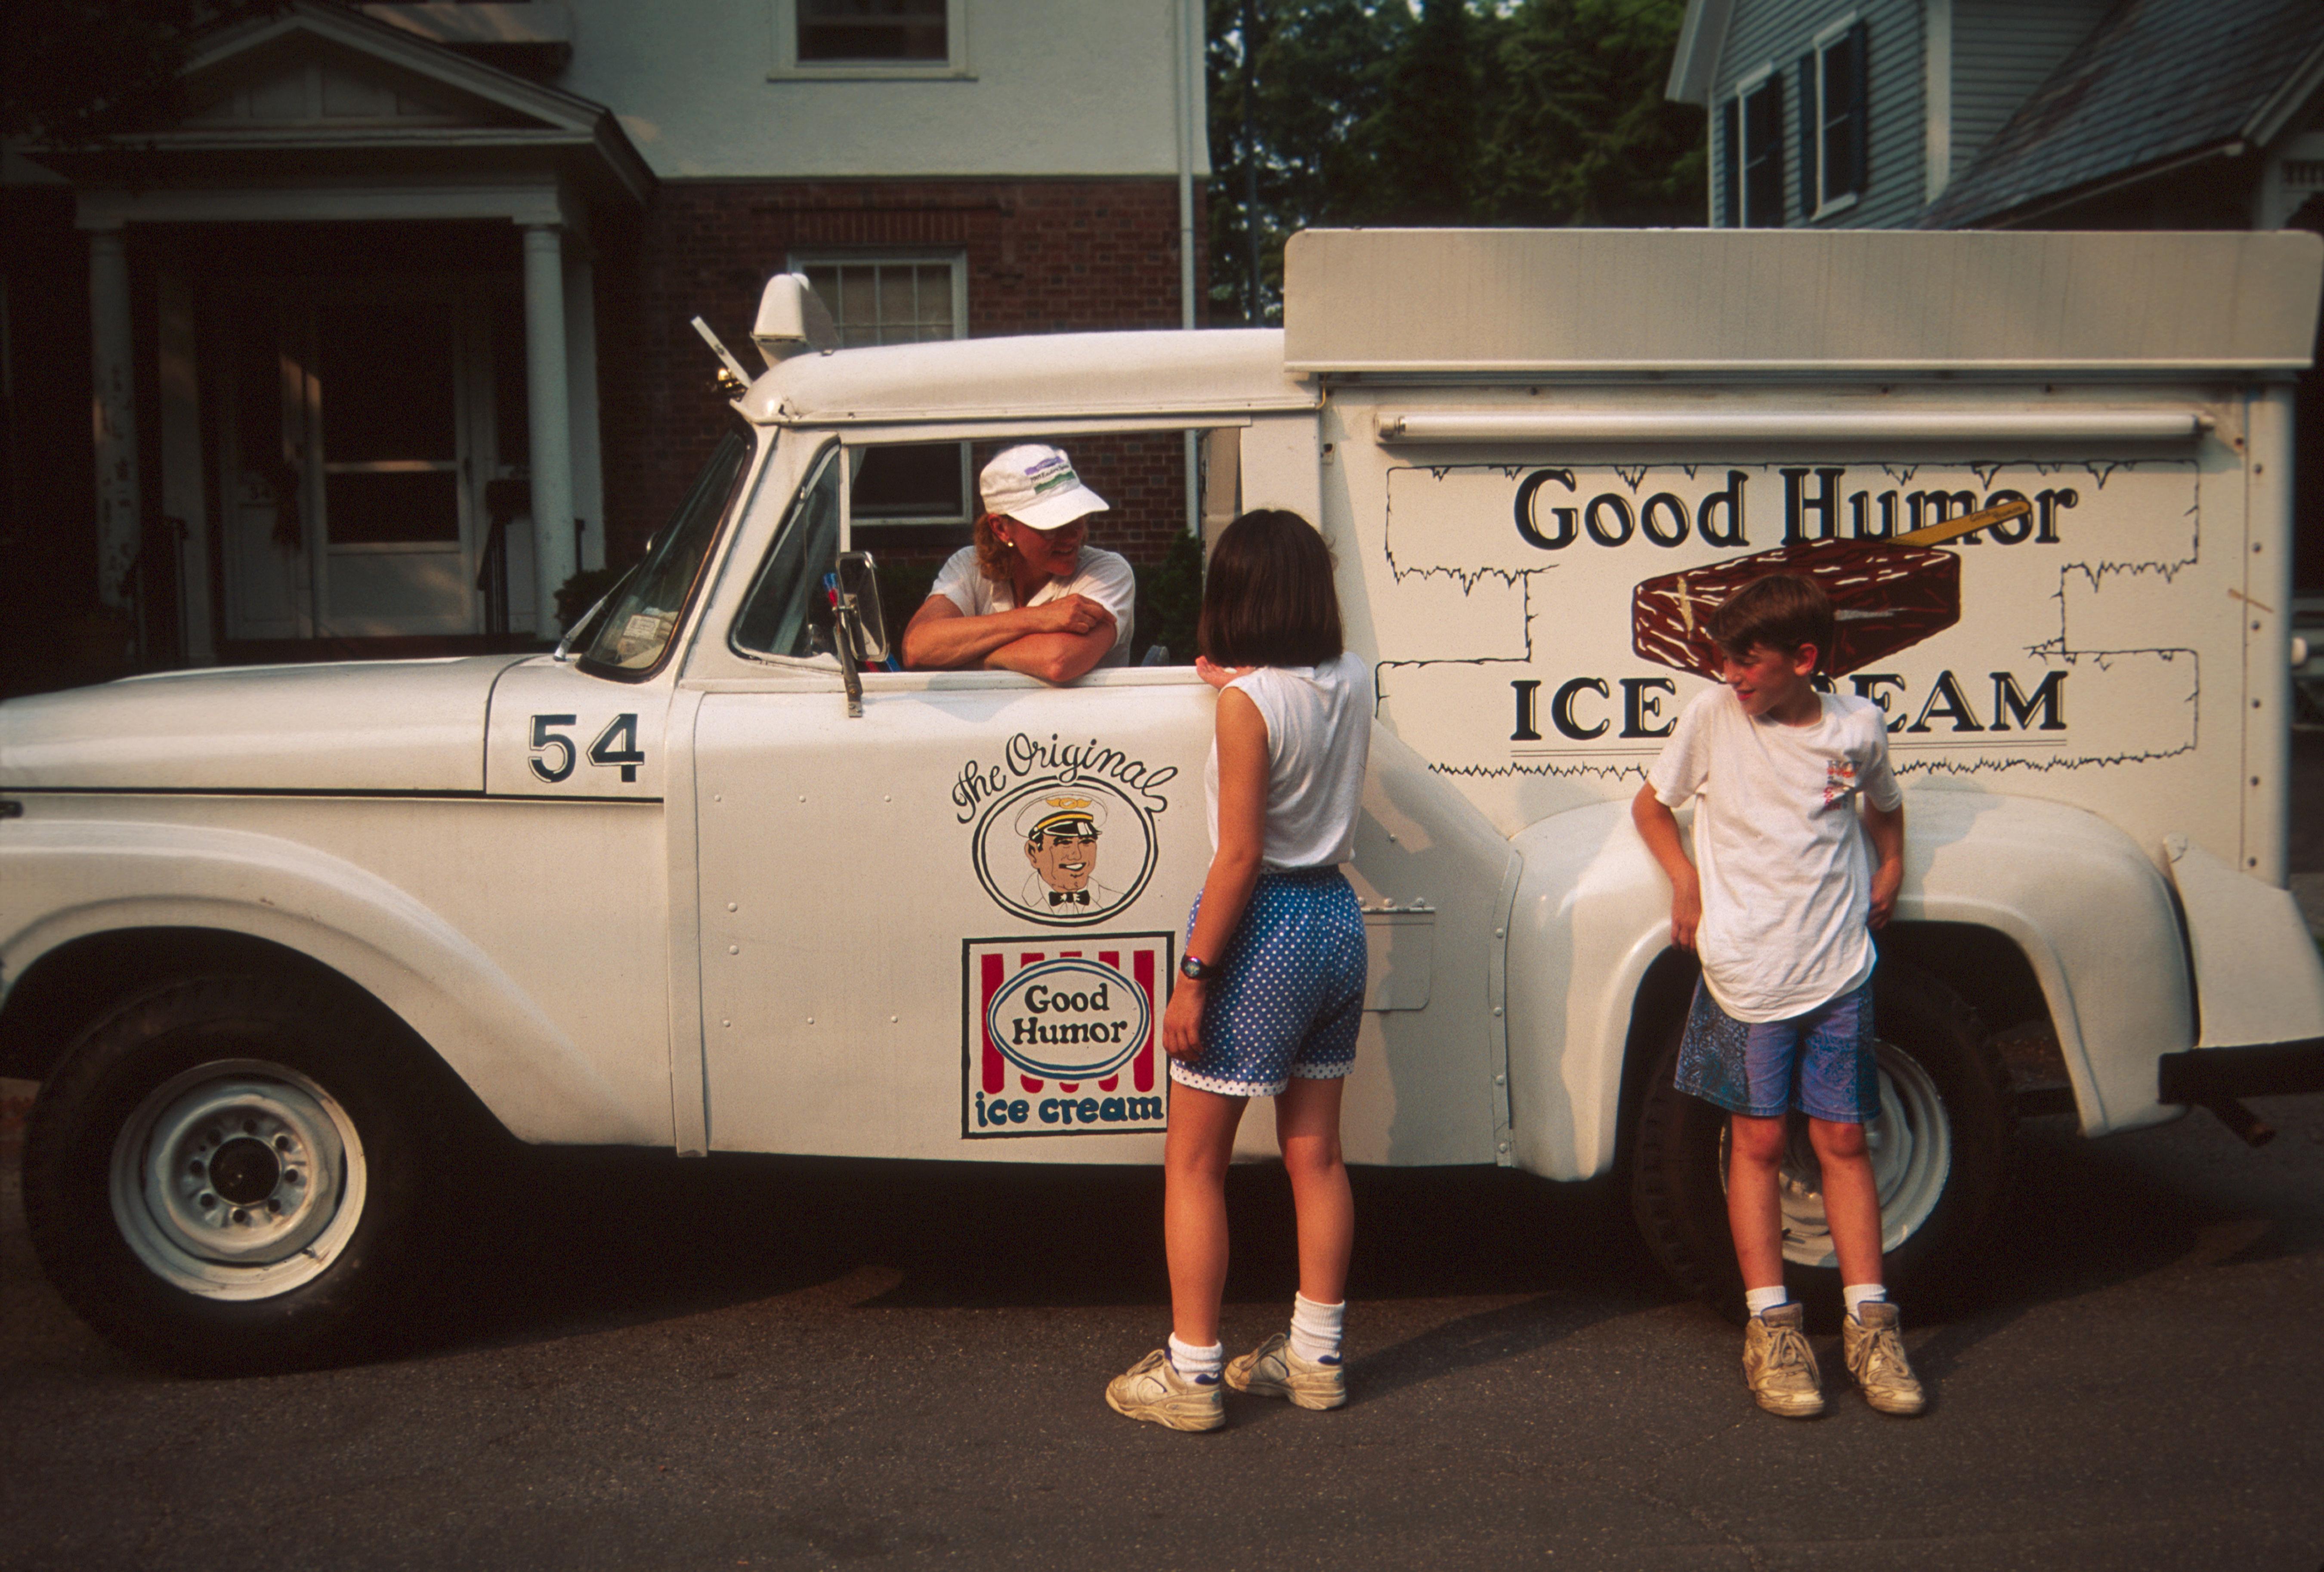 Good Humor Ice Cream Truck, Customers Talking To Driver.